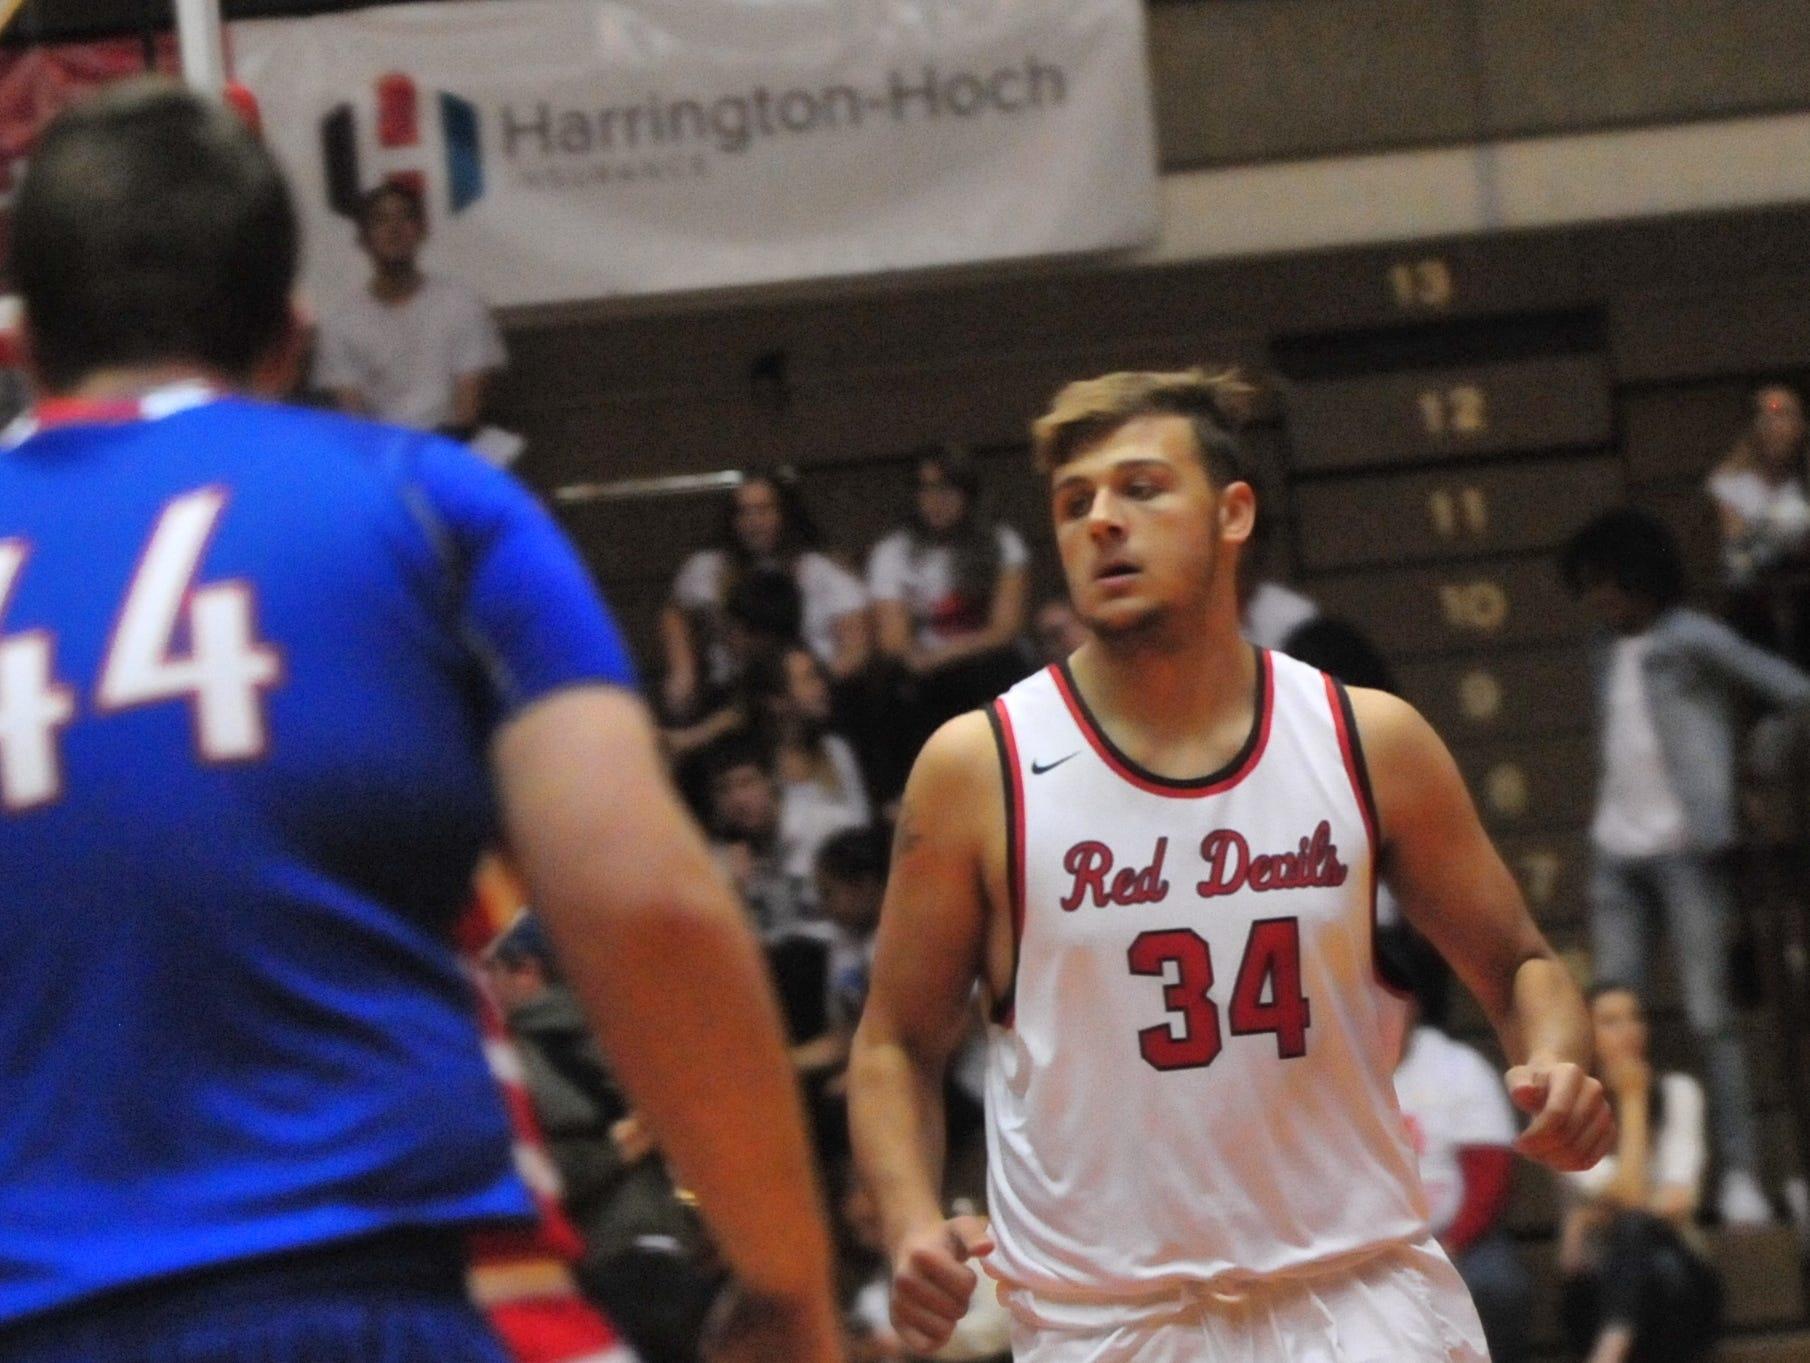 Zach Hill (34) of the Richmond High School boys basketball team during a boys basketball game against Jay County Saturday, Nov. 24, 2018 at Richmond High School's Tiernan Center.